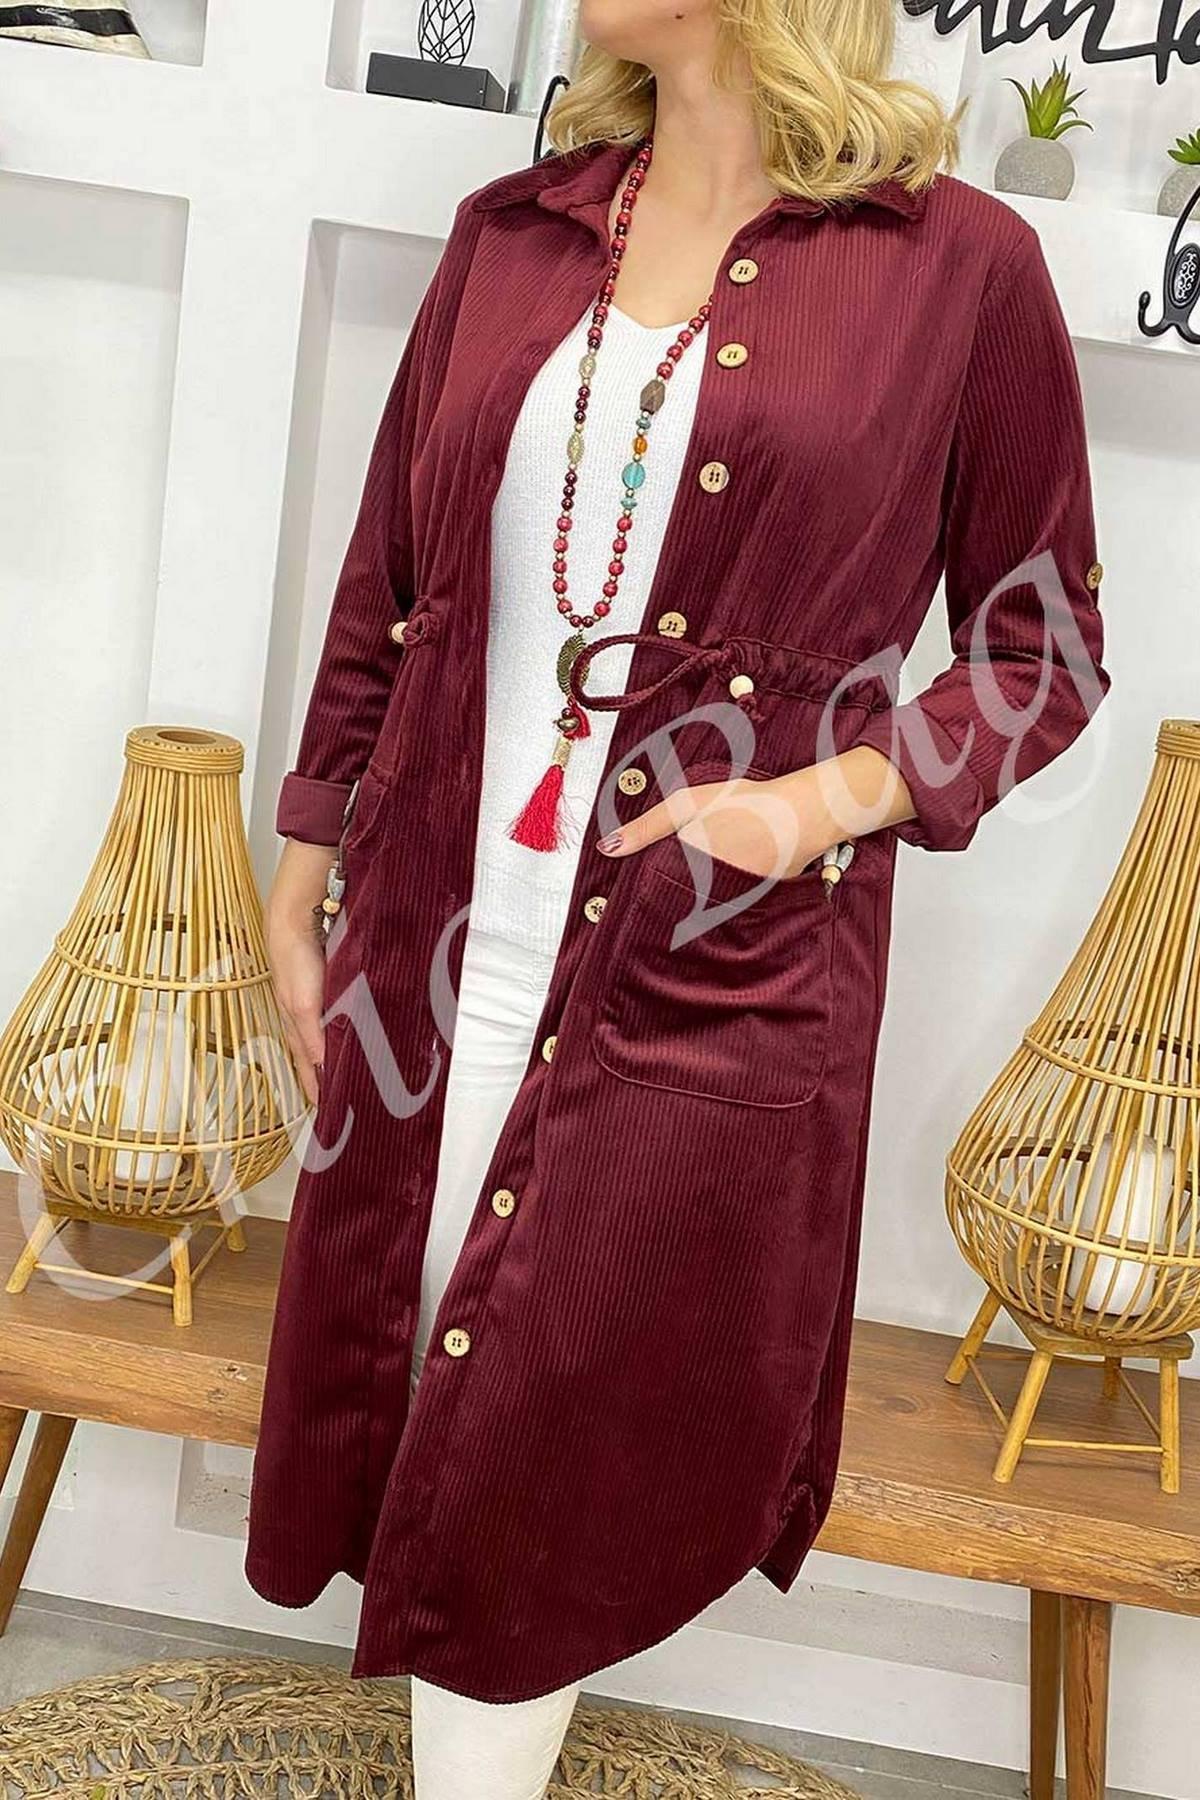 https://resim.chicbag.com.tr/chb06970101/brd/pnr-kadife-gomlek-yaka-beli-baglamali-cebi-dugmeli-uzun-gomlek-elbise-chb-000636-01ab104f8a8c.